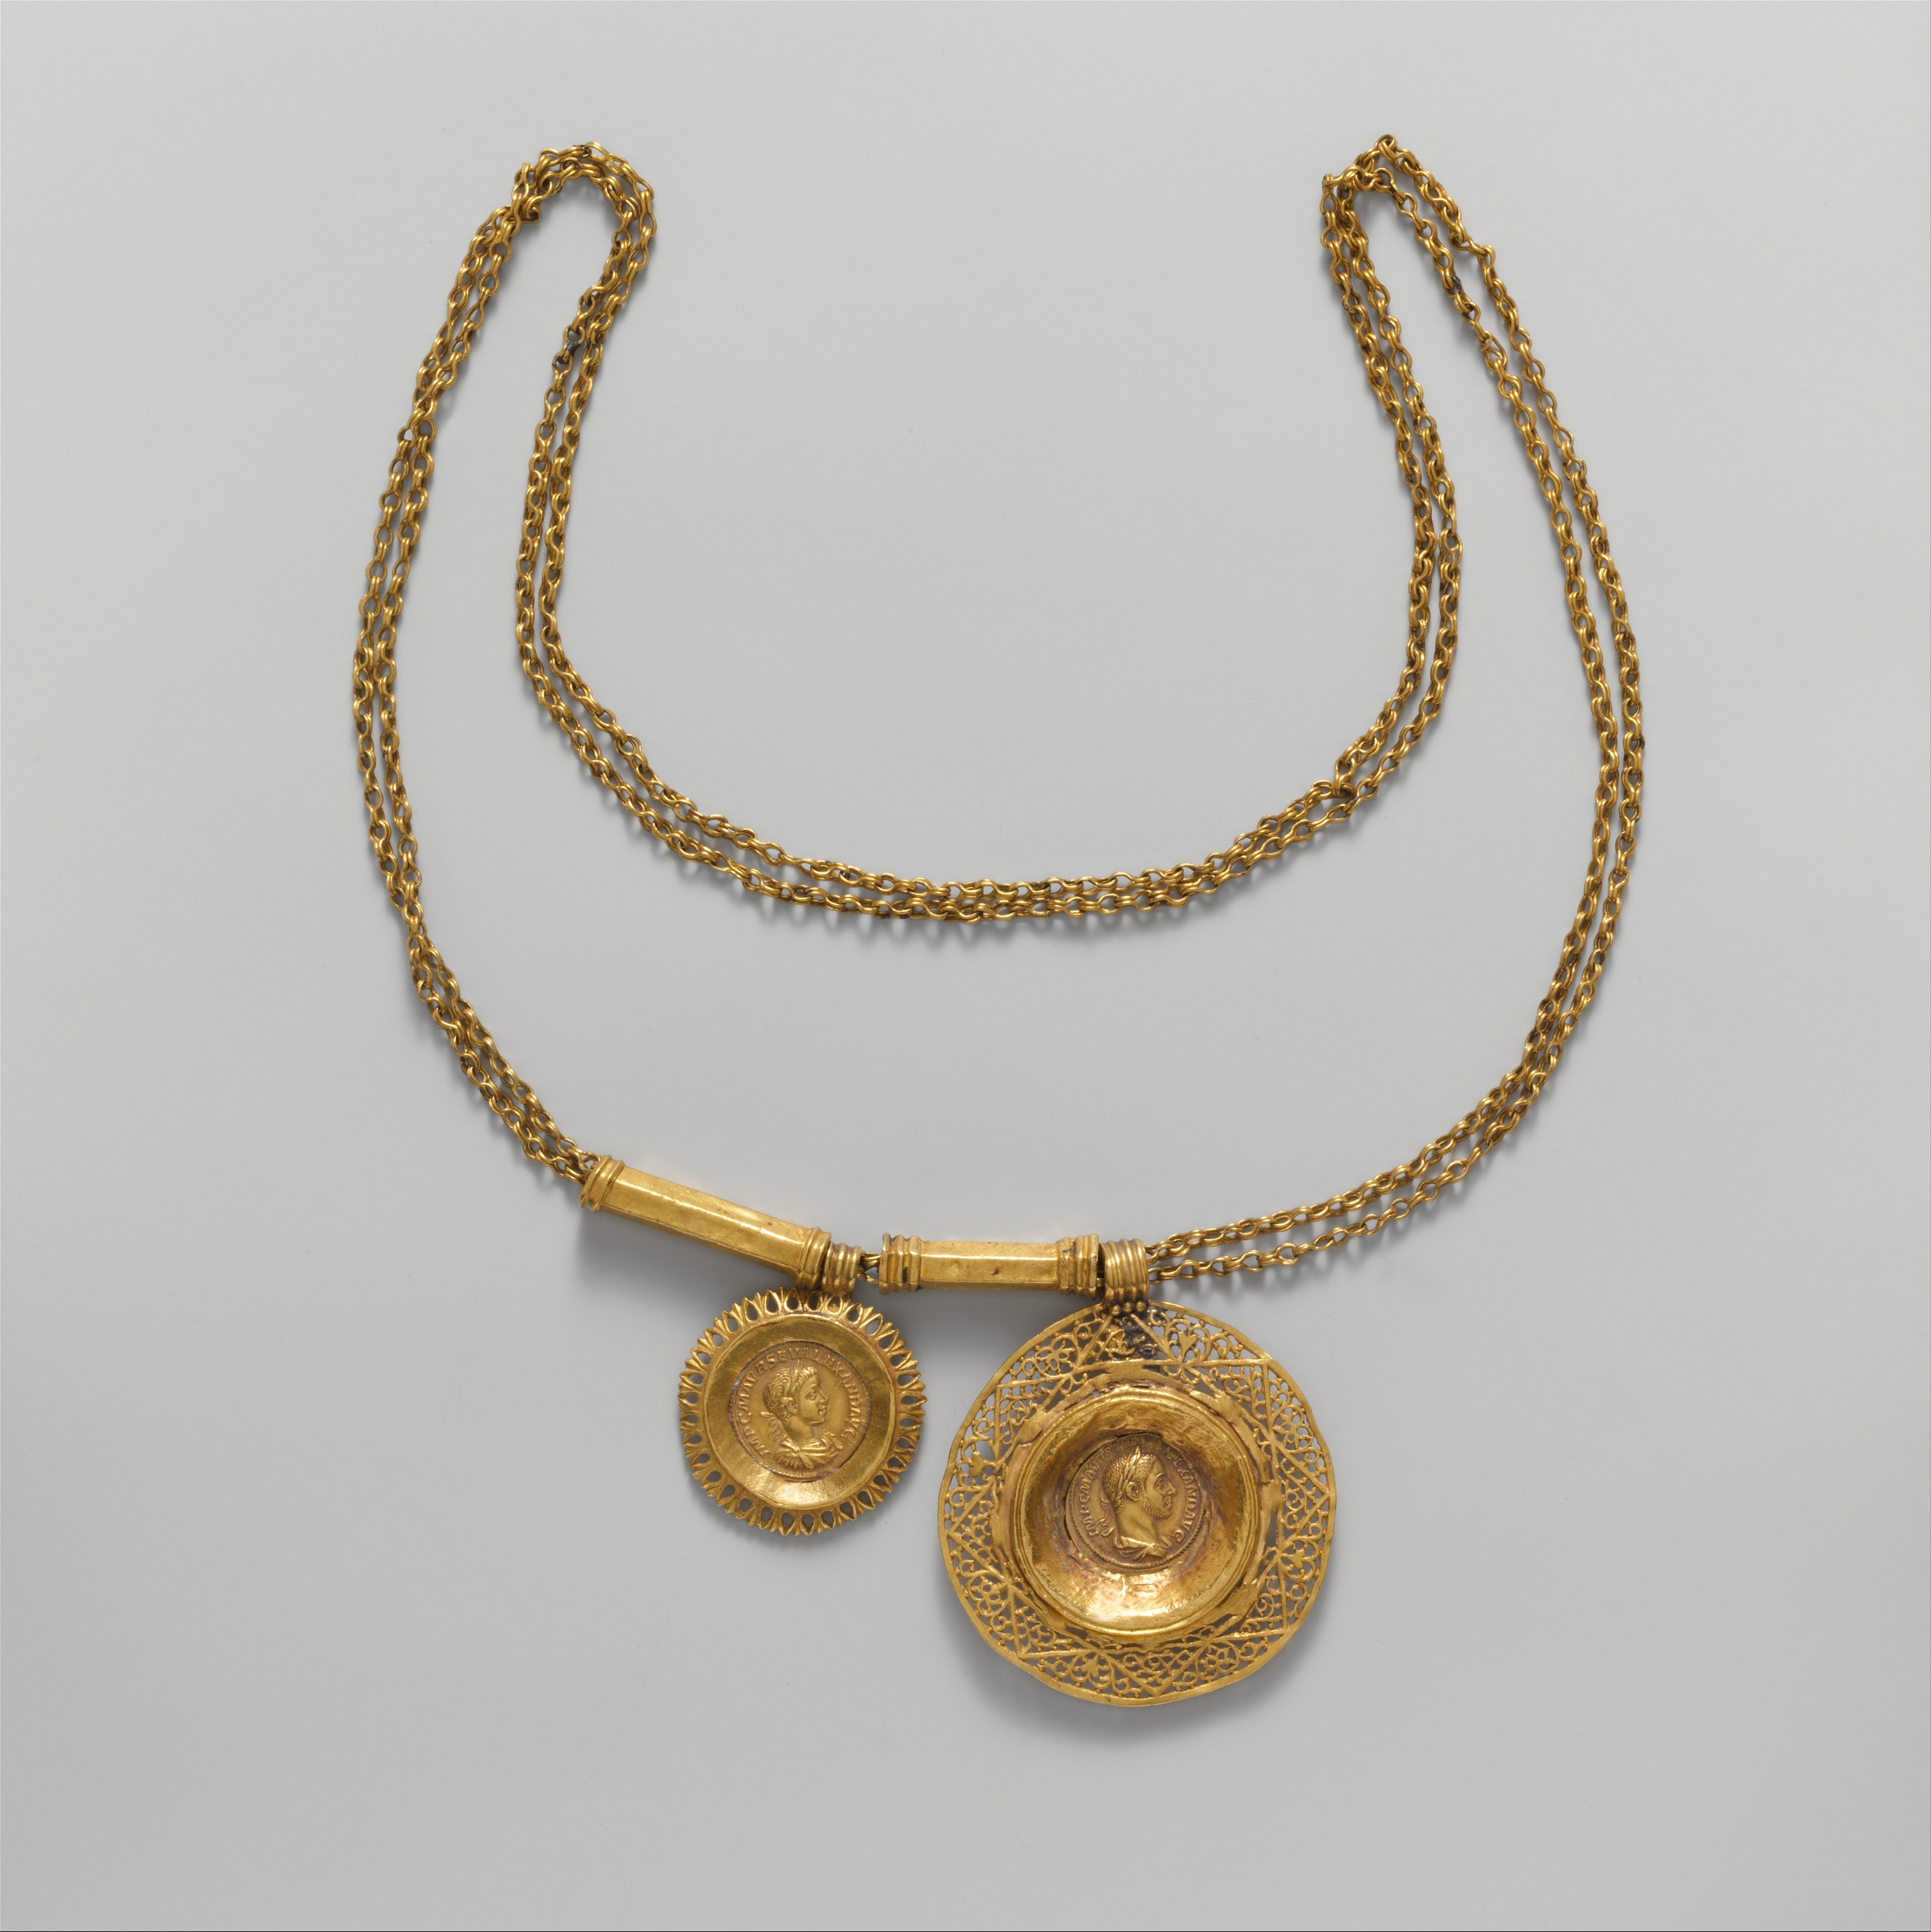 Roman period pendant